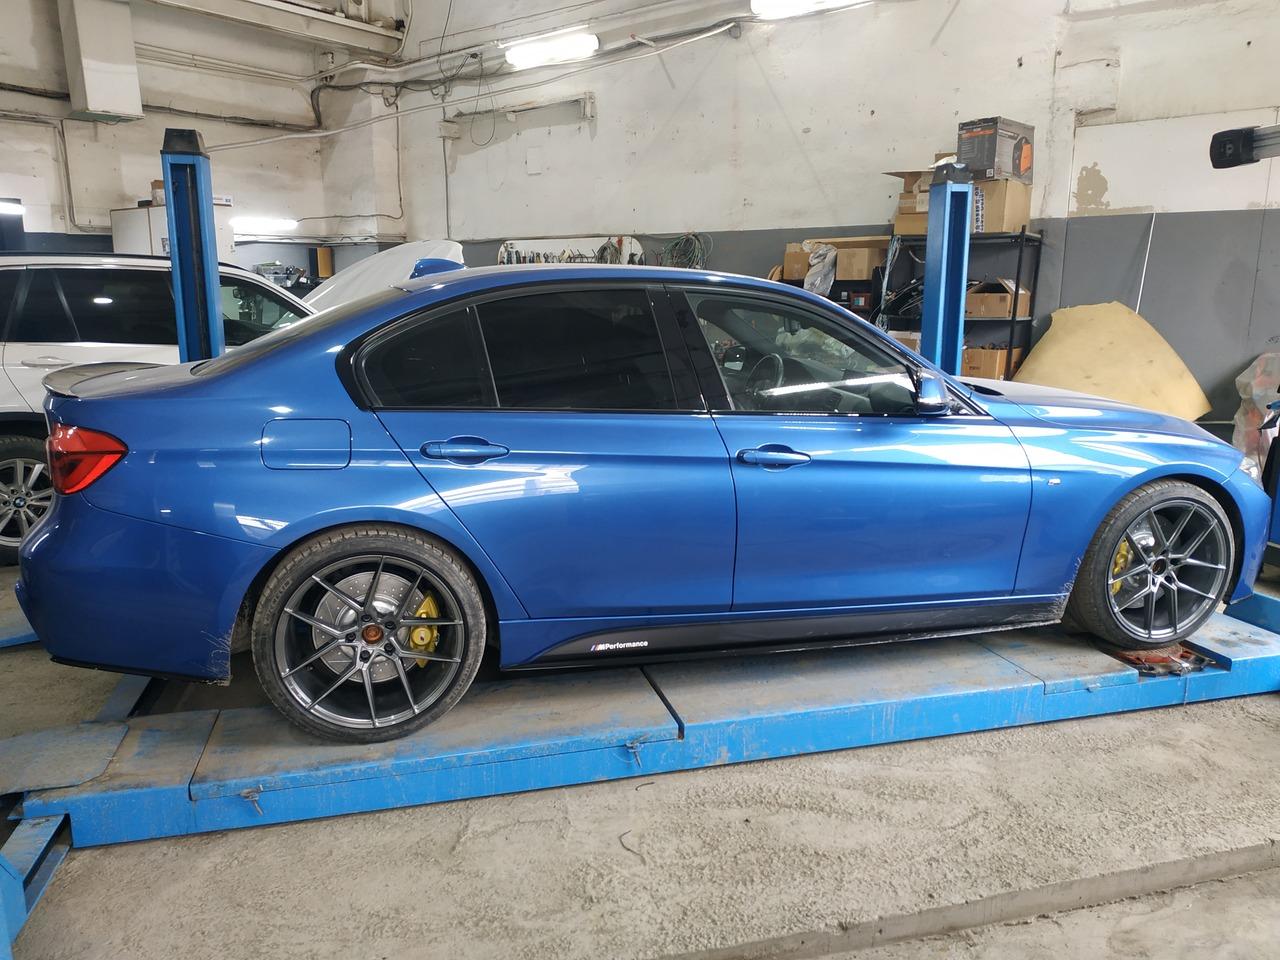 BMW F30 320dX 2018 г.в., M Performance тормоза